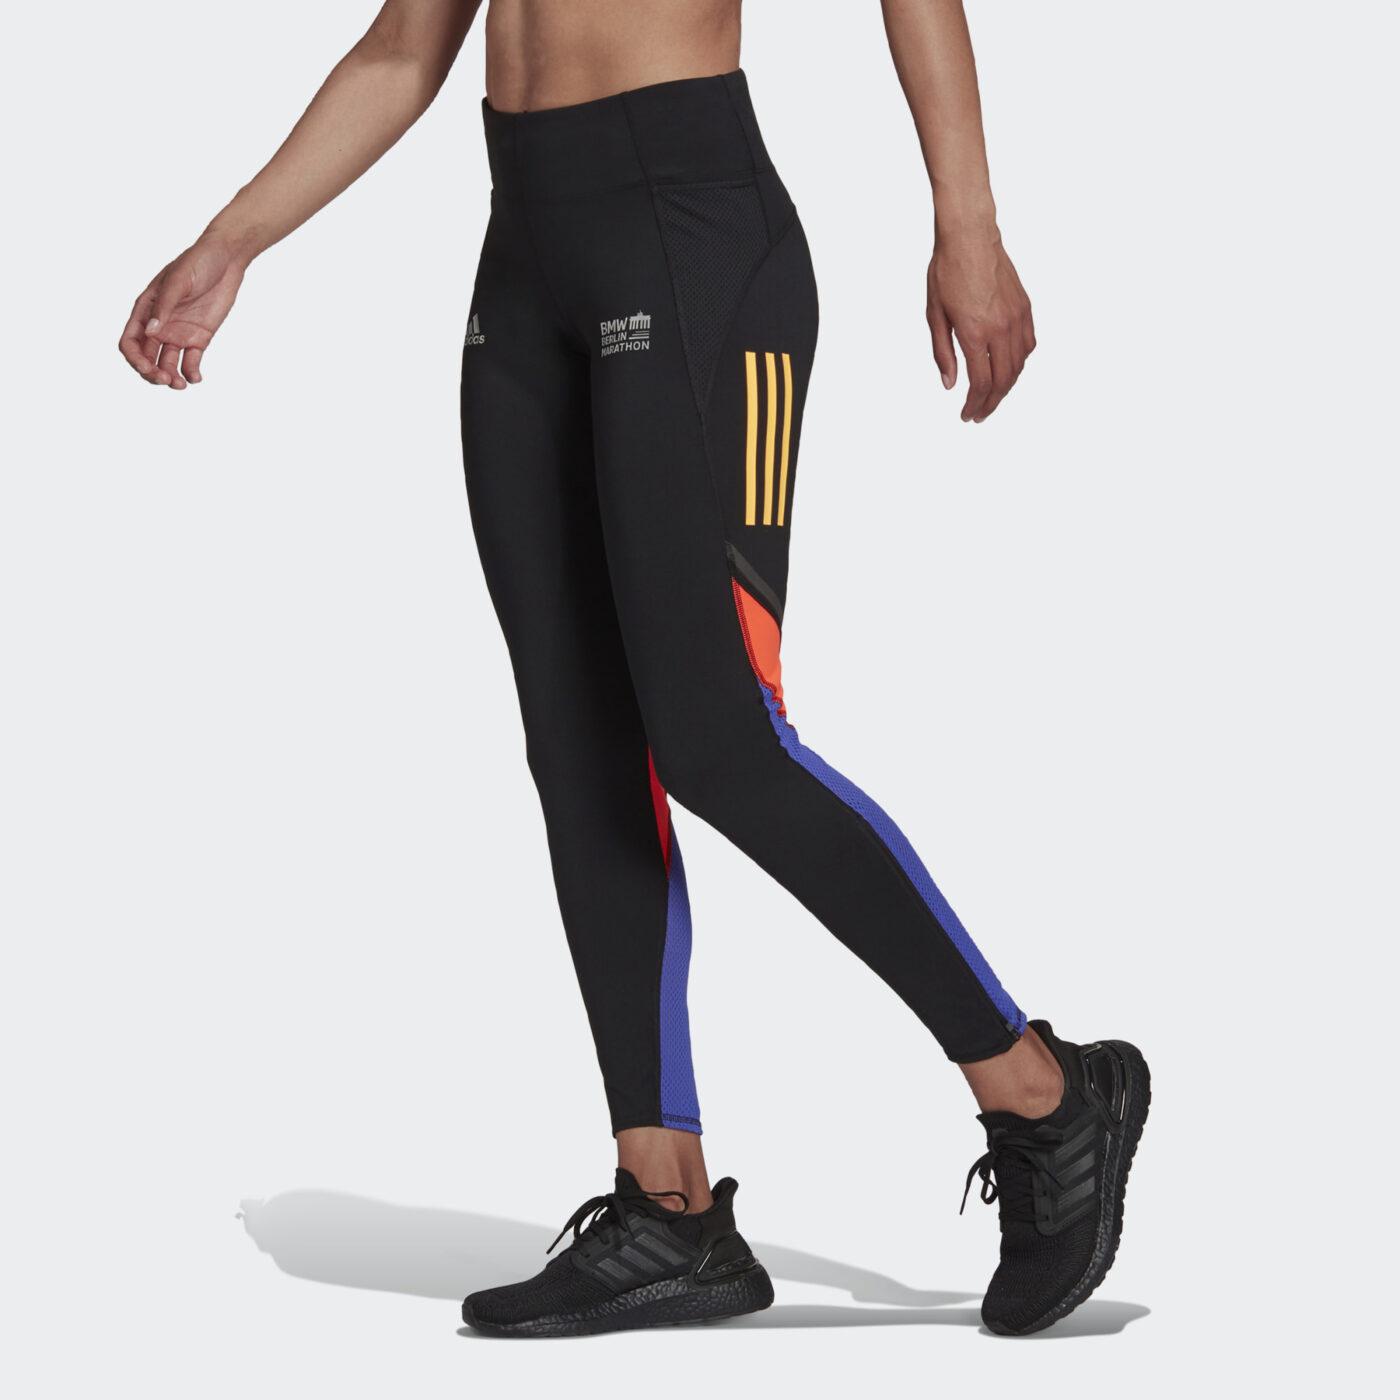 Collant Marathon Berlin 2021 adidas